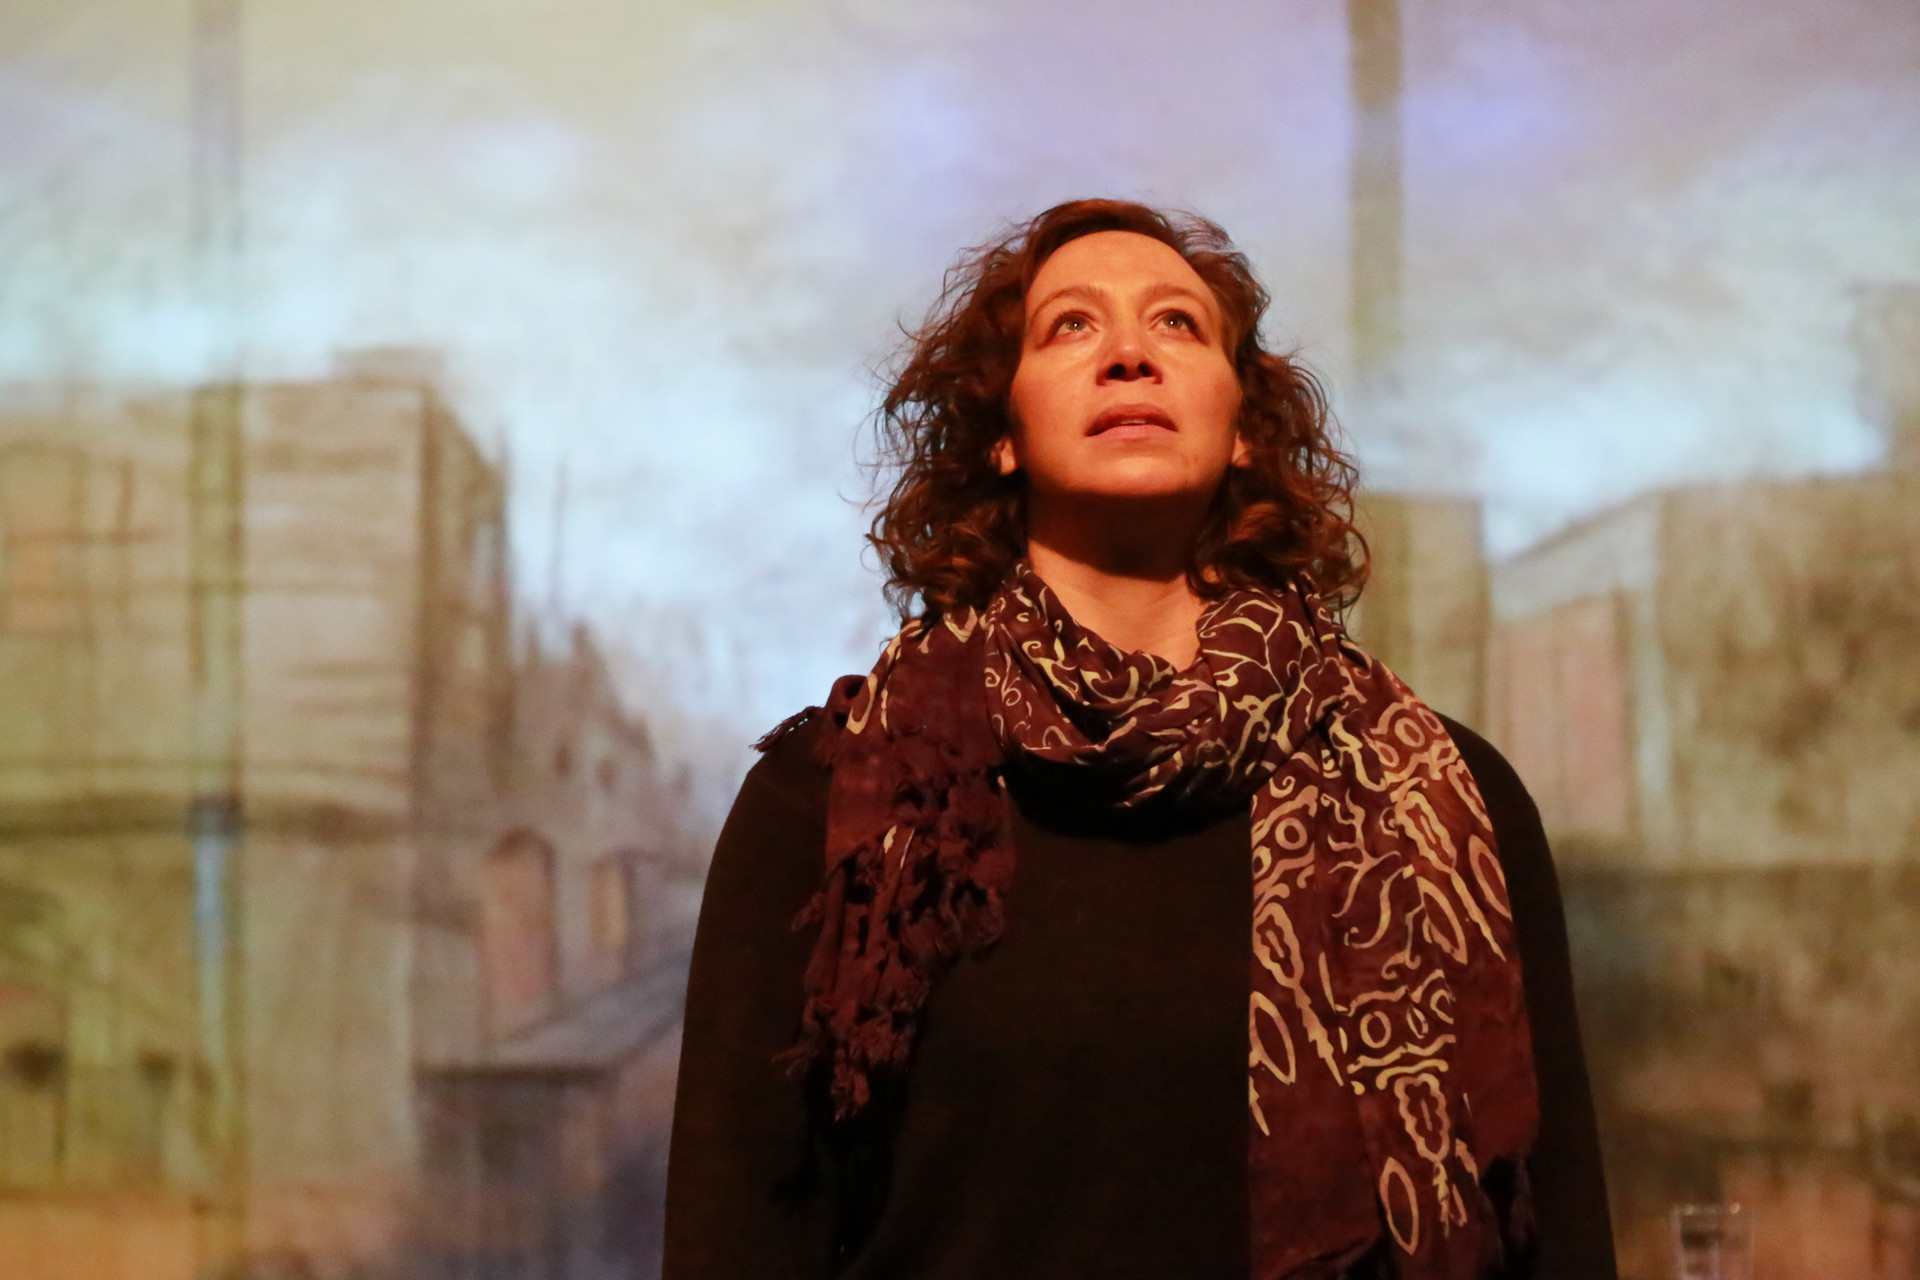 Performer Deb Radloff as Cassandra in the 2016 Dixon Place performance.